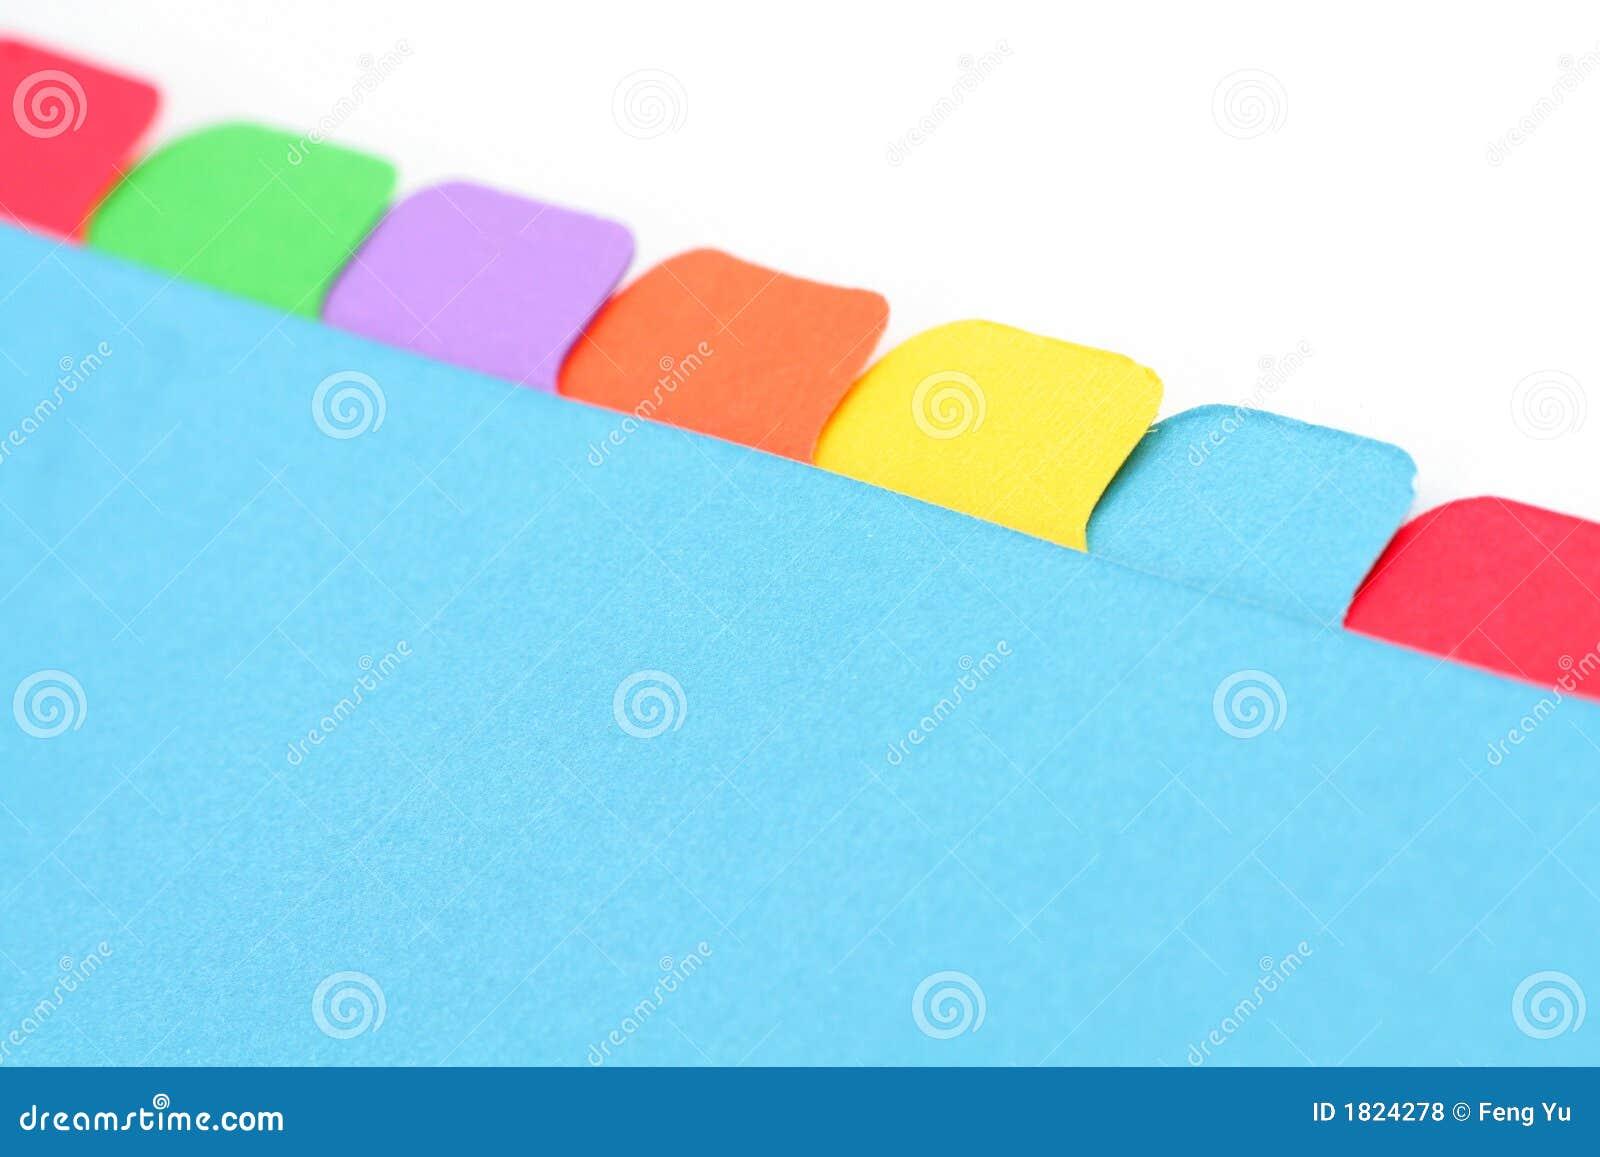 File Divider Stock Photo Image Of Data Paper Filing